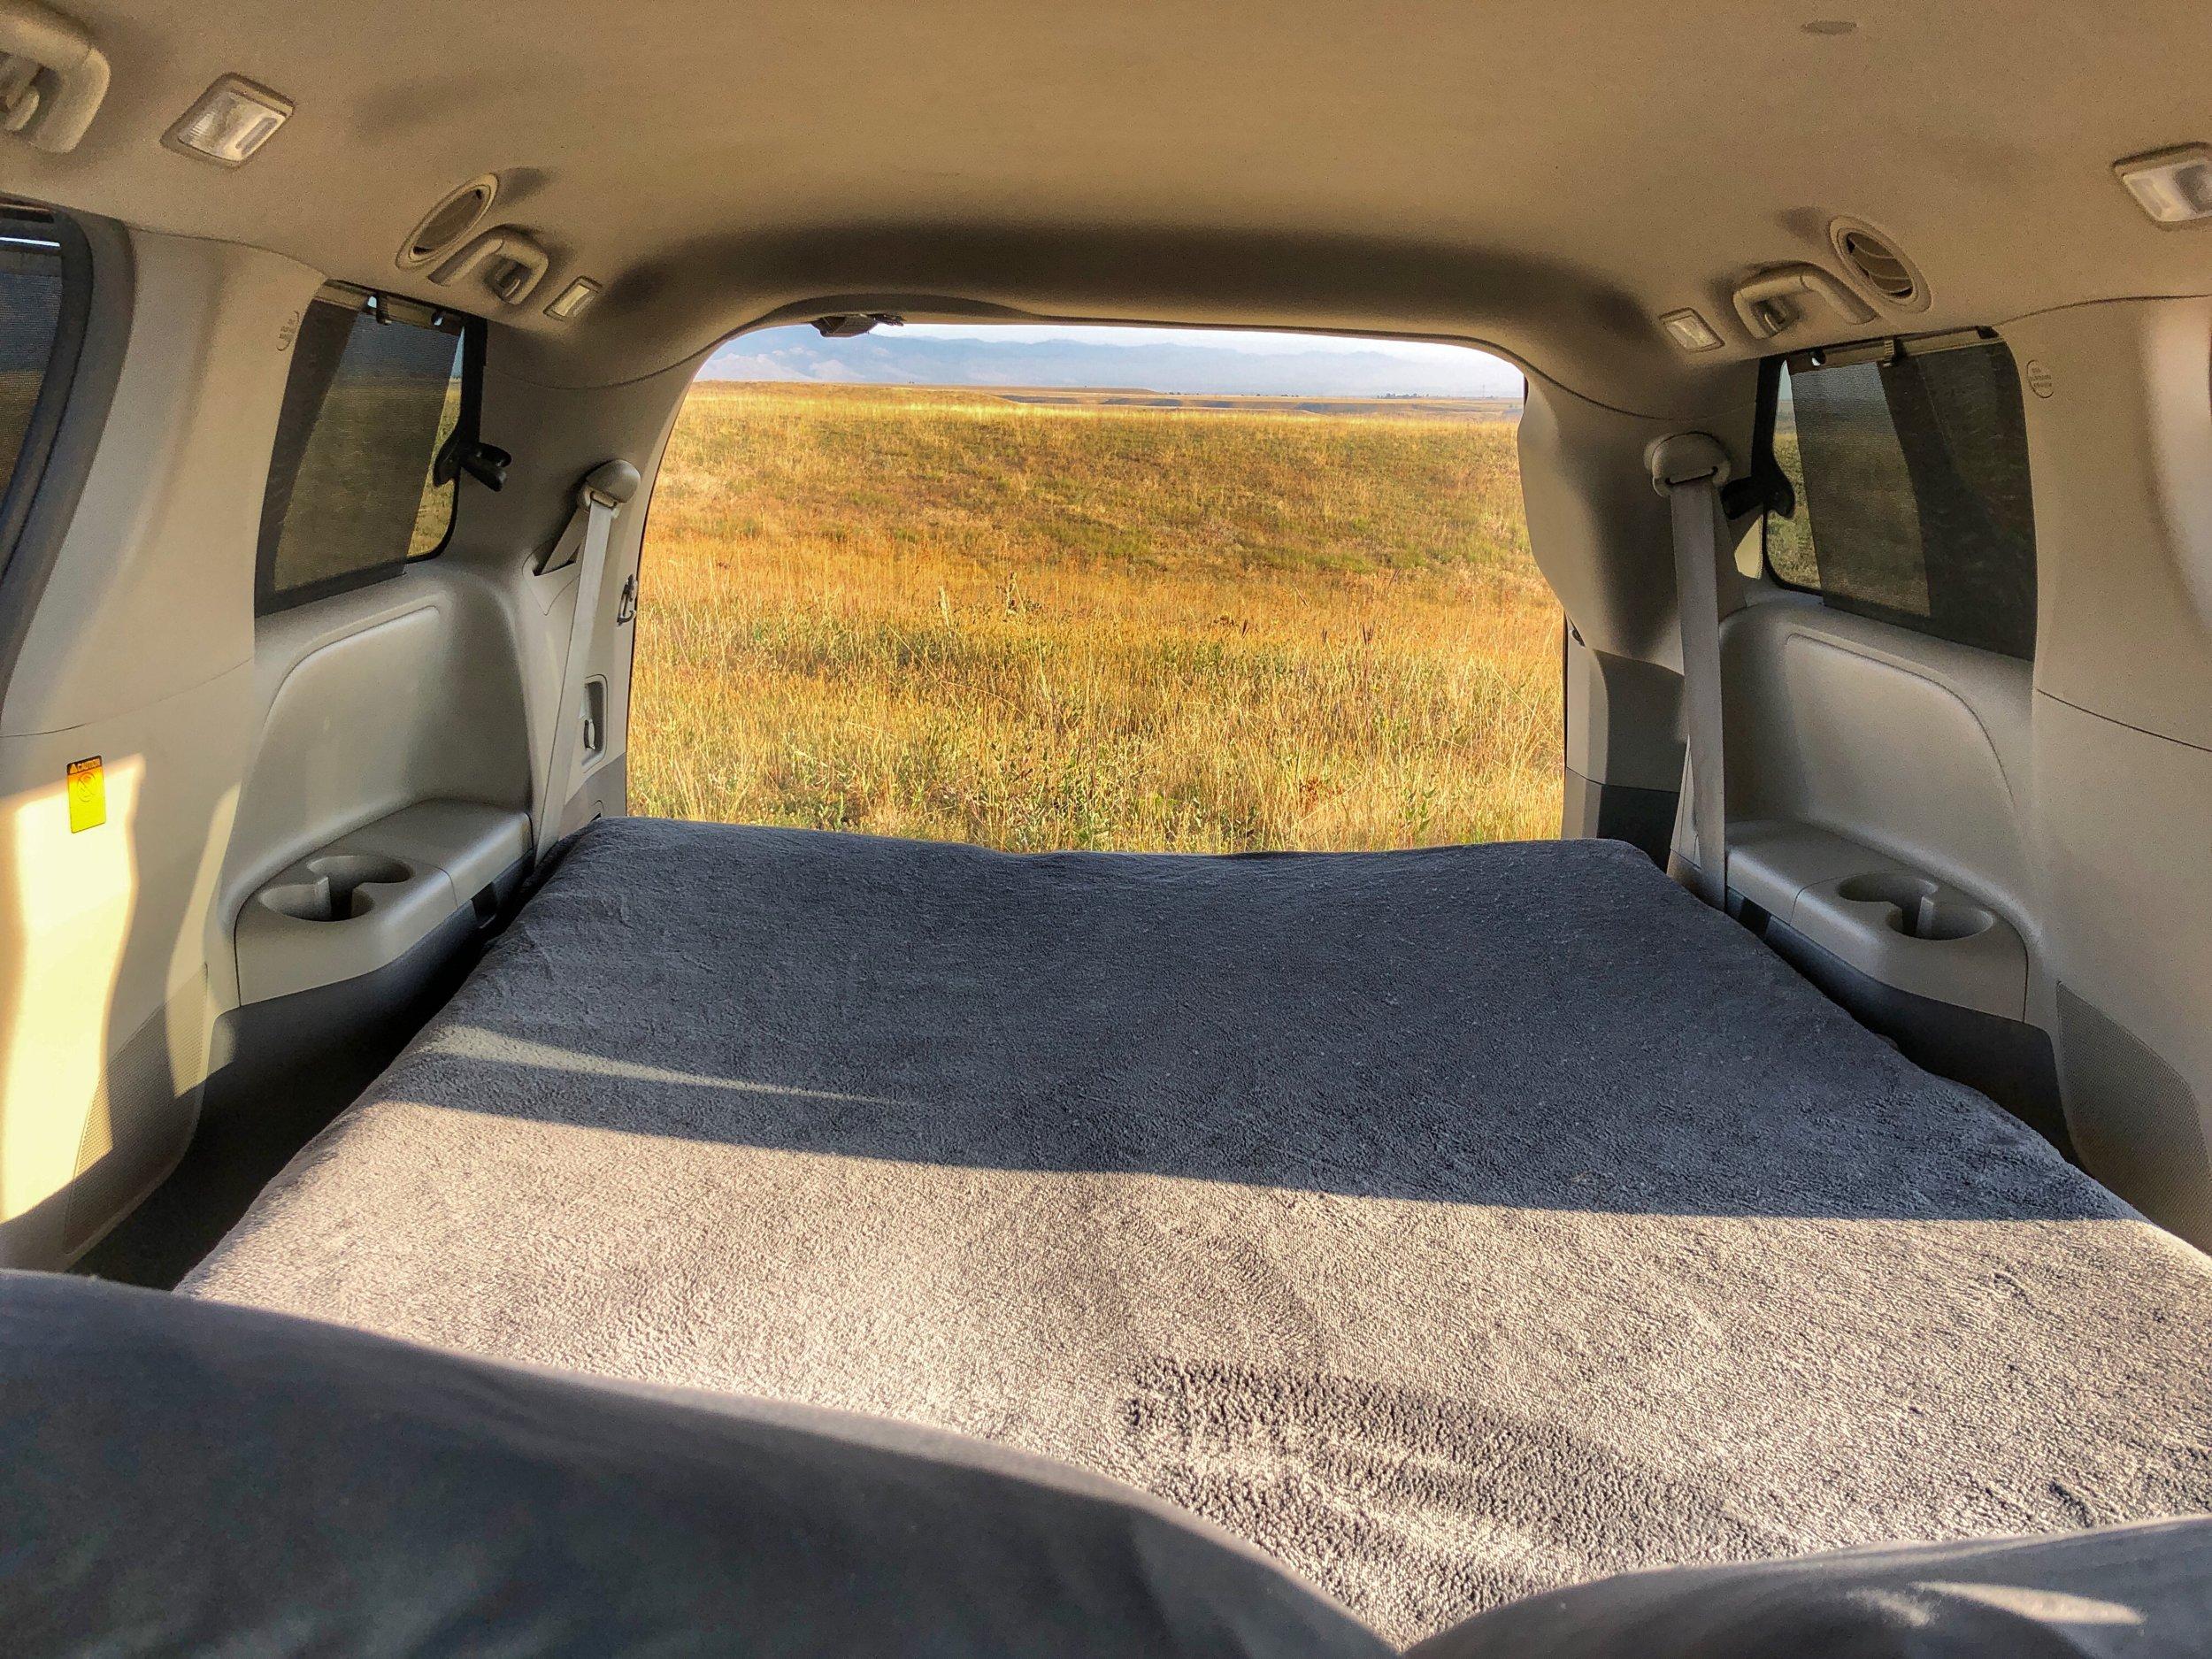 Minivan bed rear view